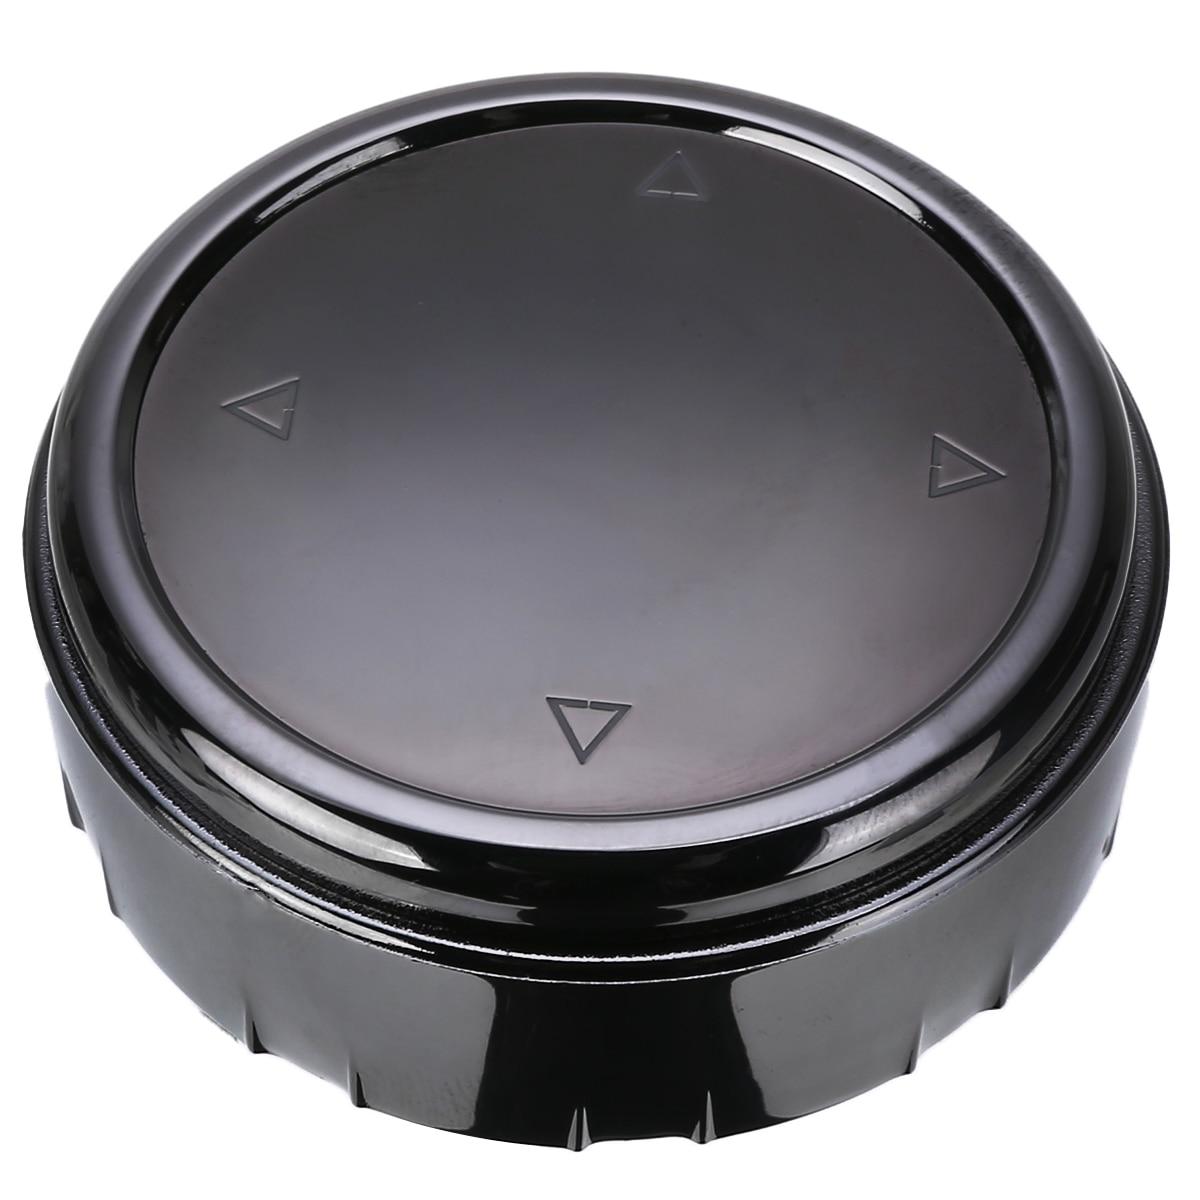 1pc Auto Multimedia iDrive Knob Abdeckung Trim NBT Controller Moulding Für BMW 1 3 5 SeriesF10 F20 F30 F32 f33 F34